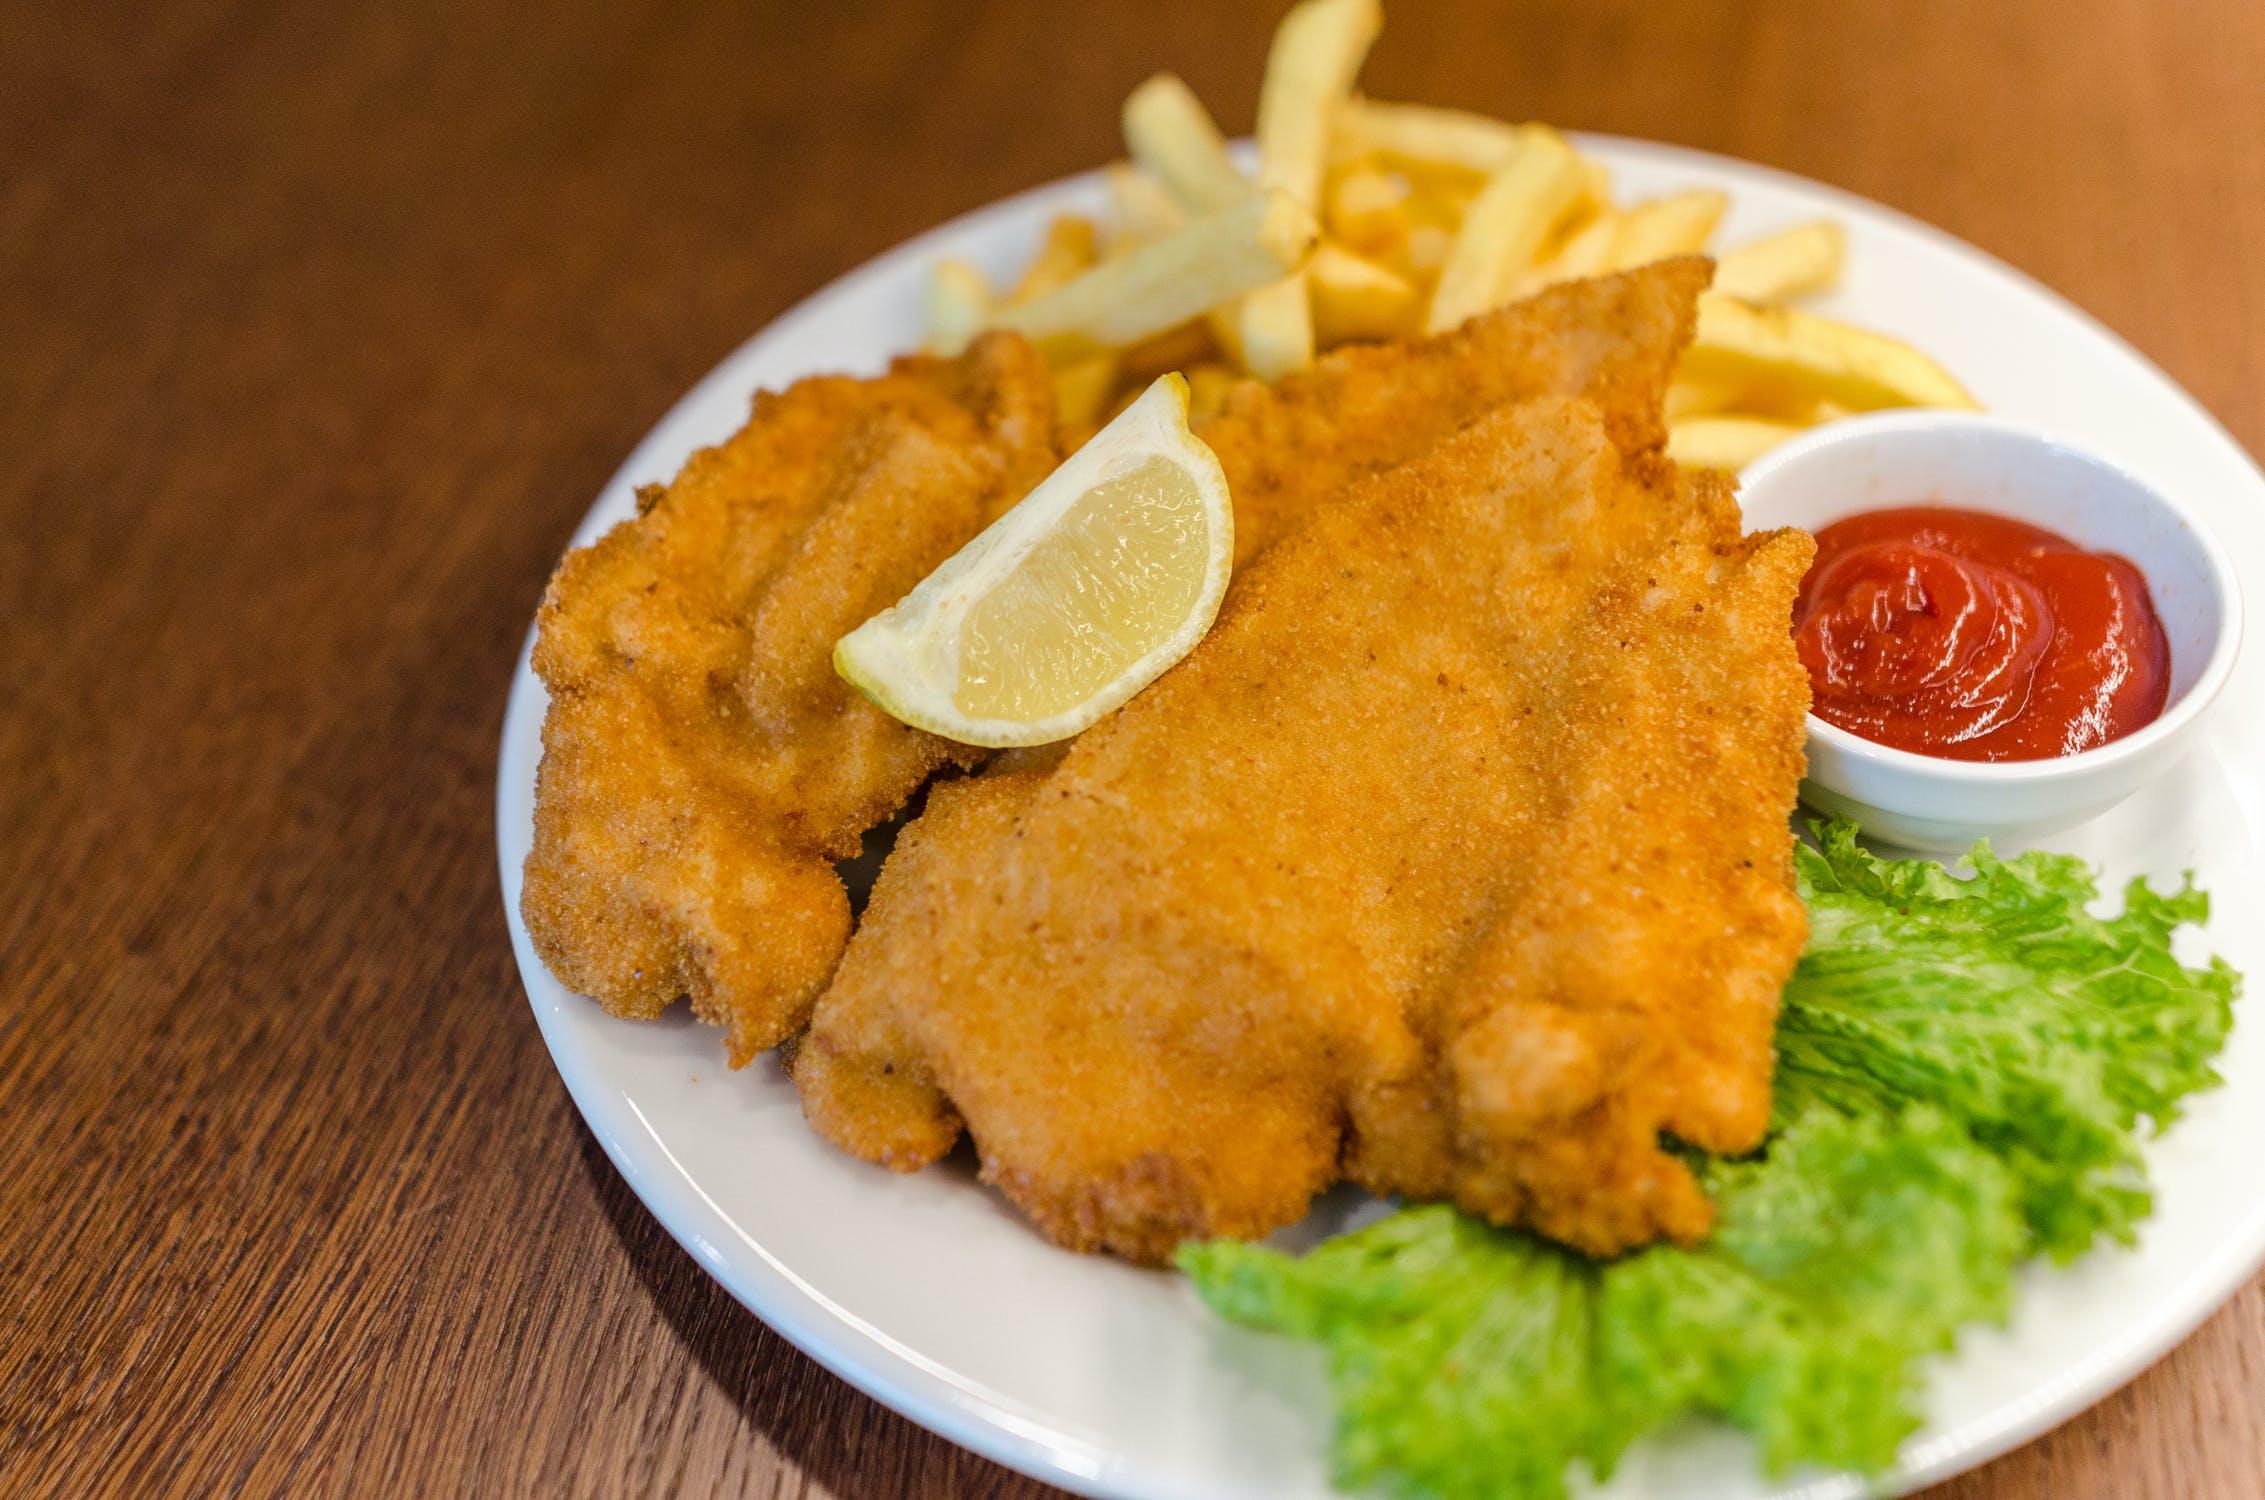 fried fish. deep fryer, thelashop